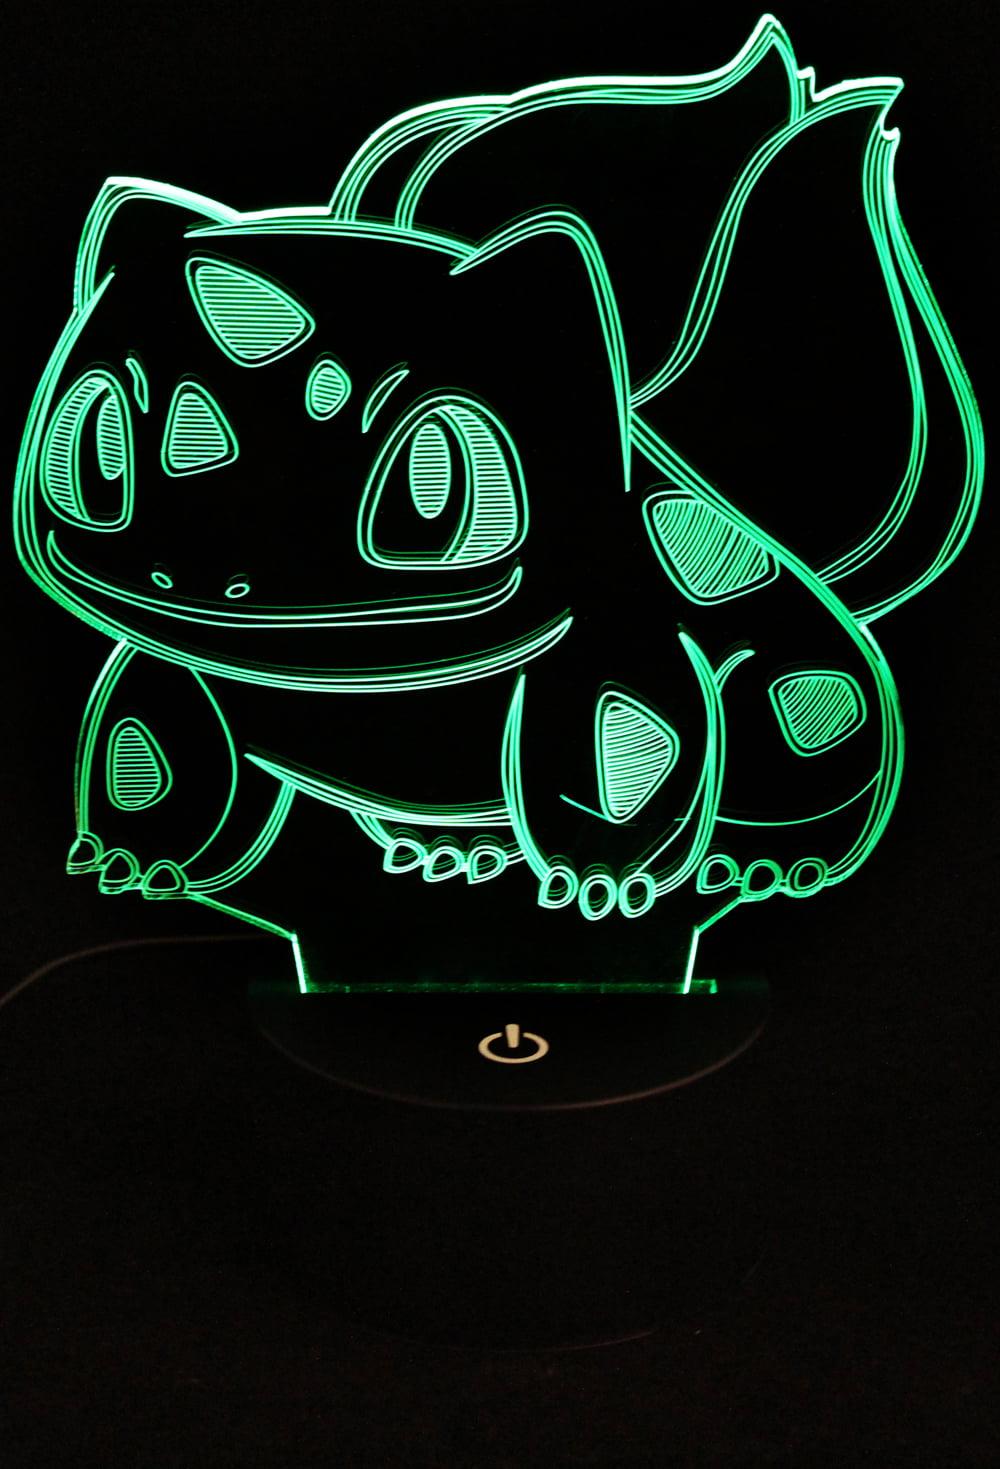 Pokemon Bulbasaur Led Acrylic Night Light With Soft Cleaning Cloth Walmart Com Walmart Com